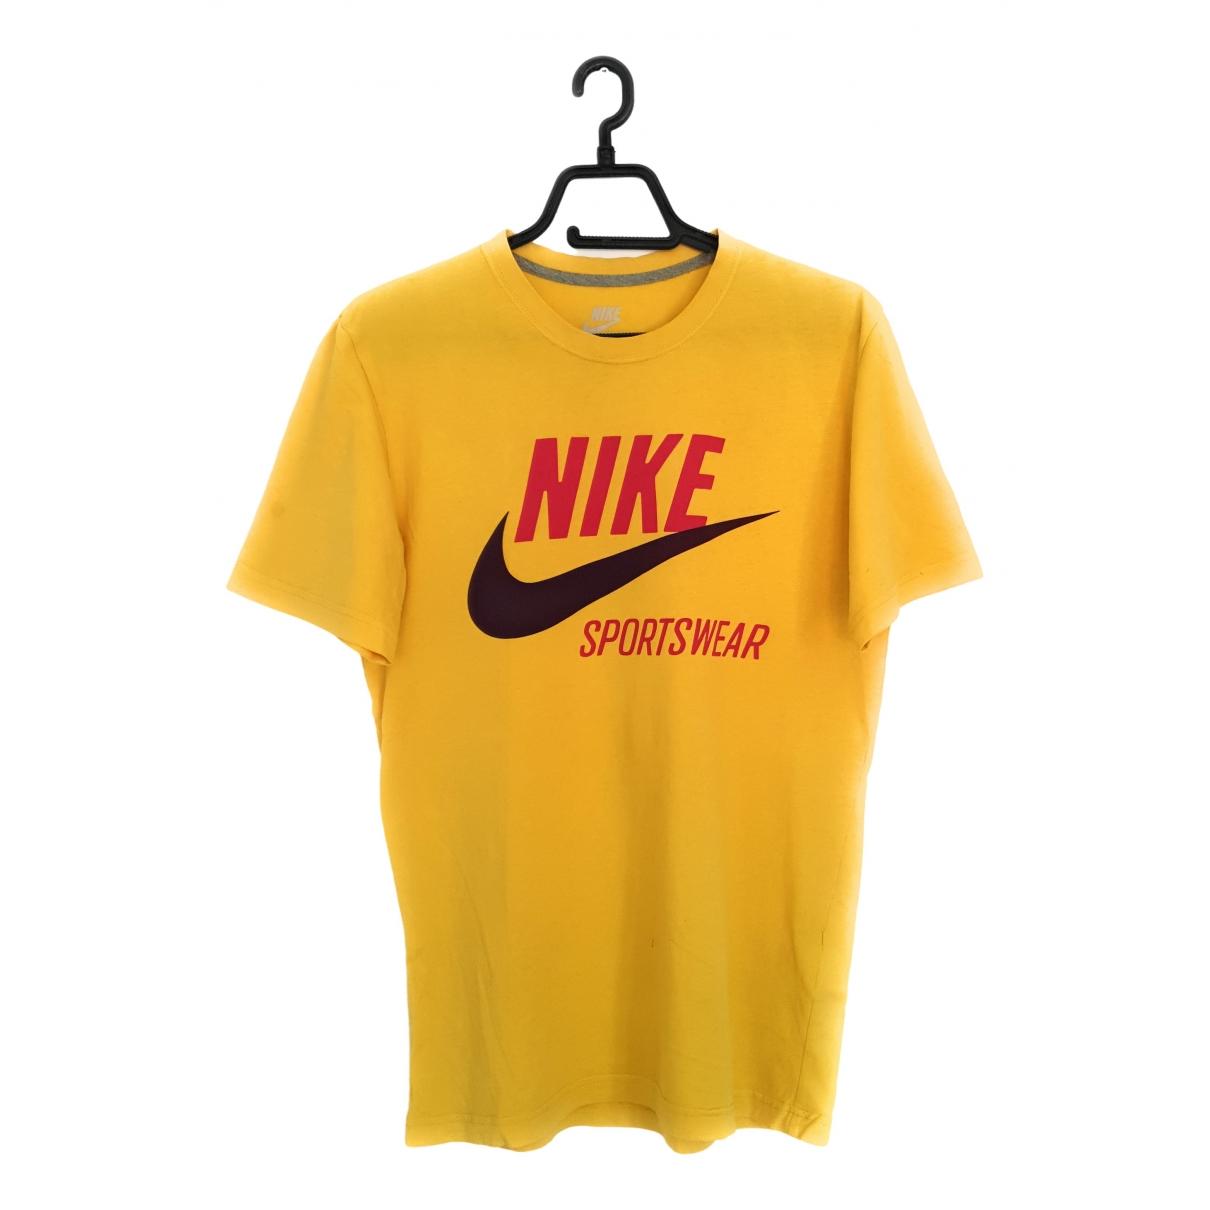 Nike \N Yellow Cotton T-shirts for Men S International